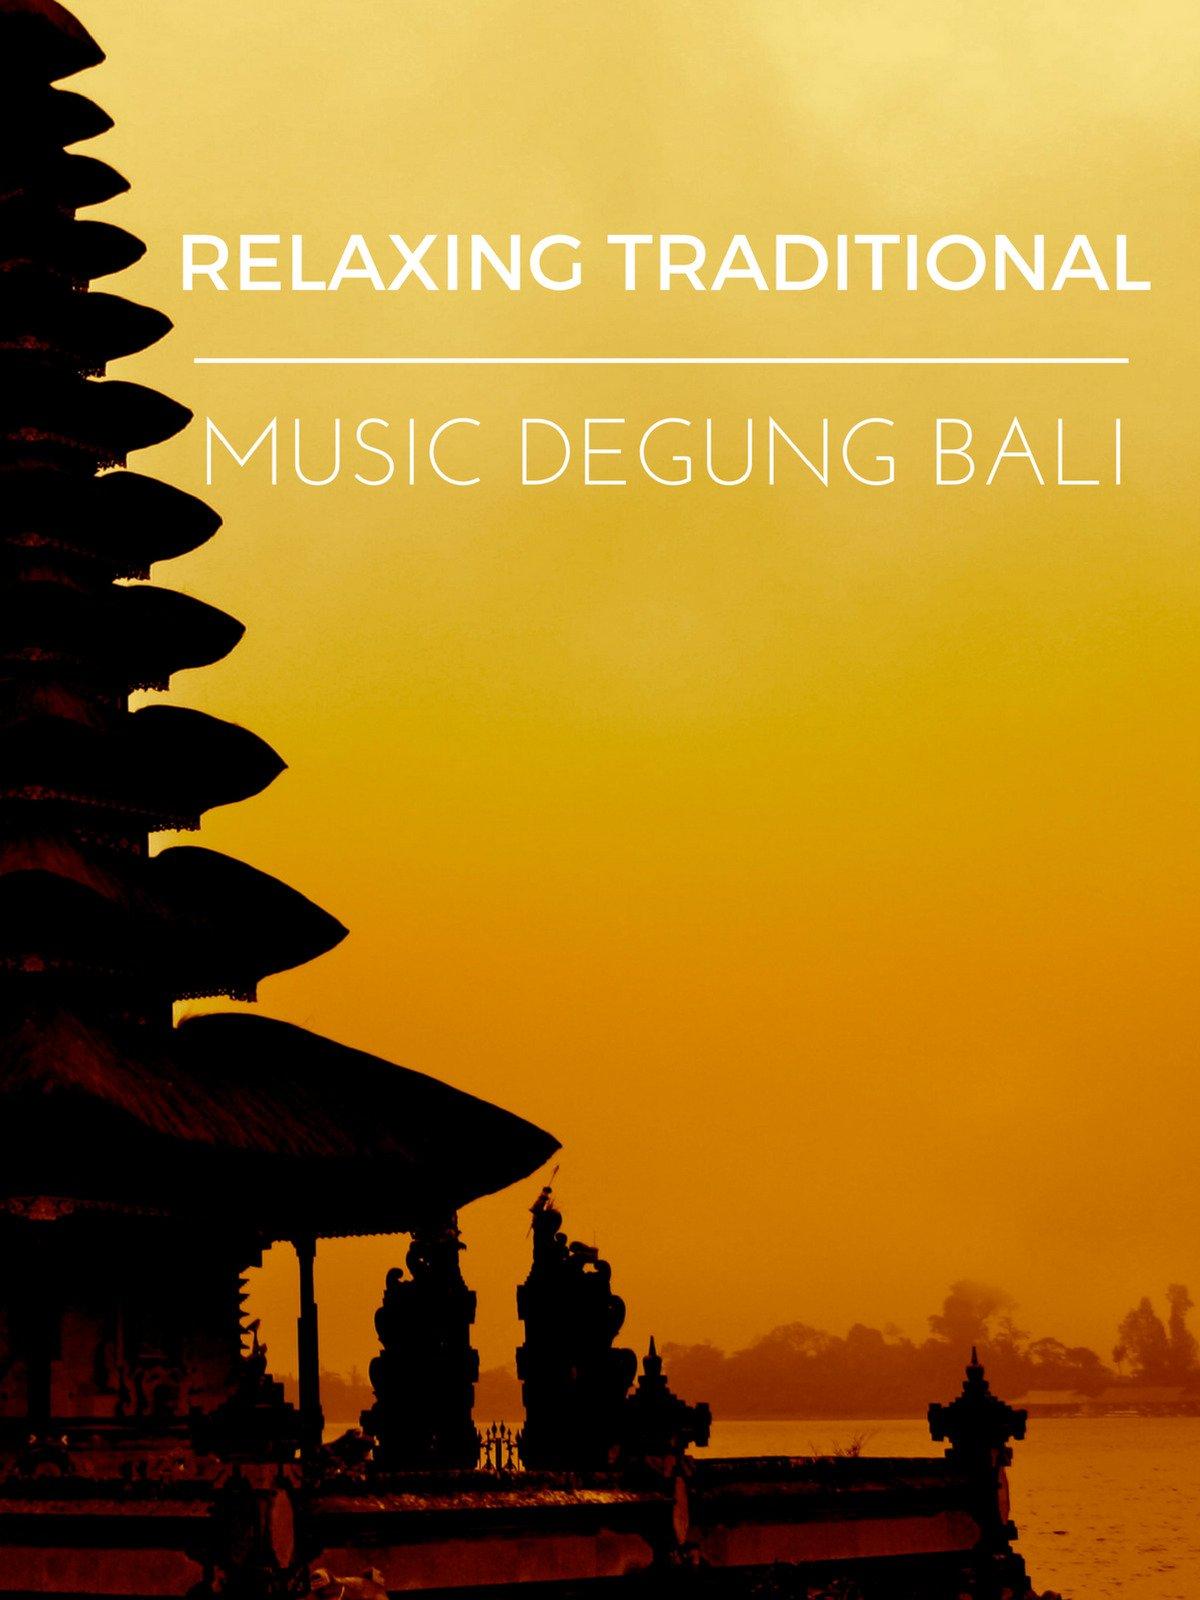 Relaxing Traditional Music Degung Bali